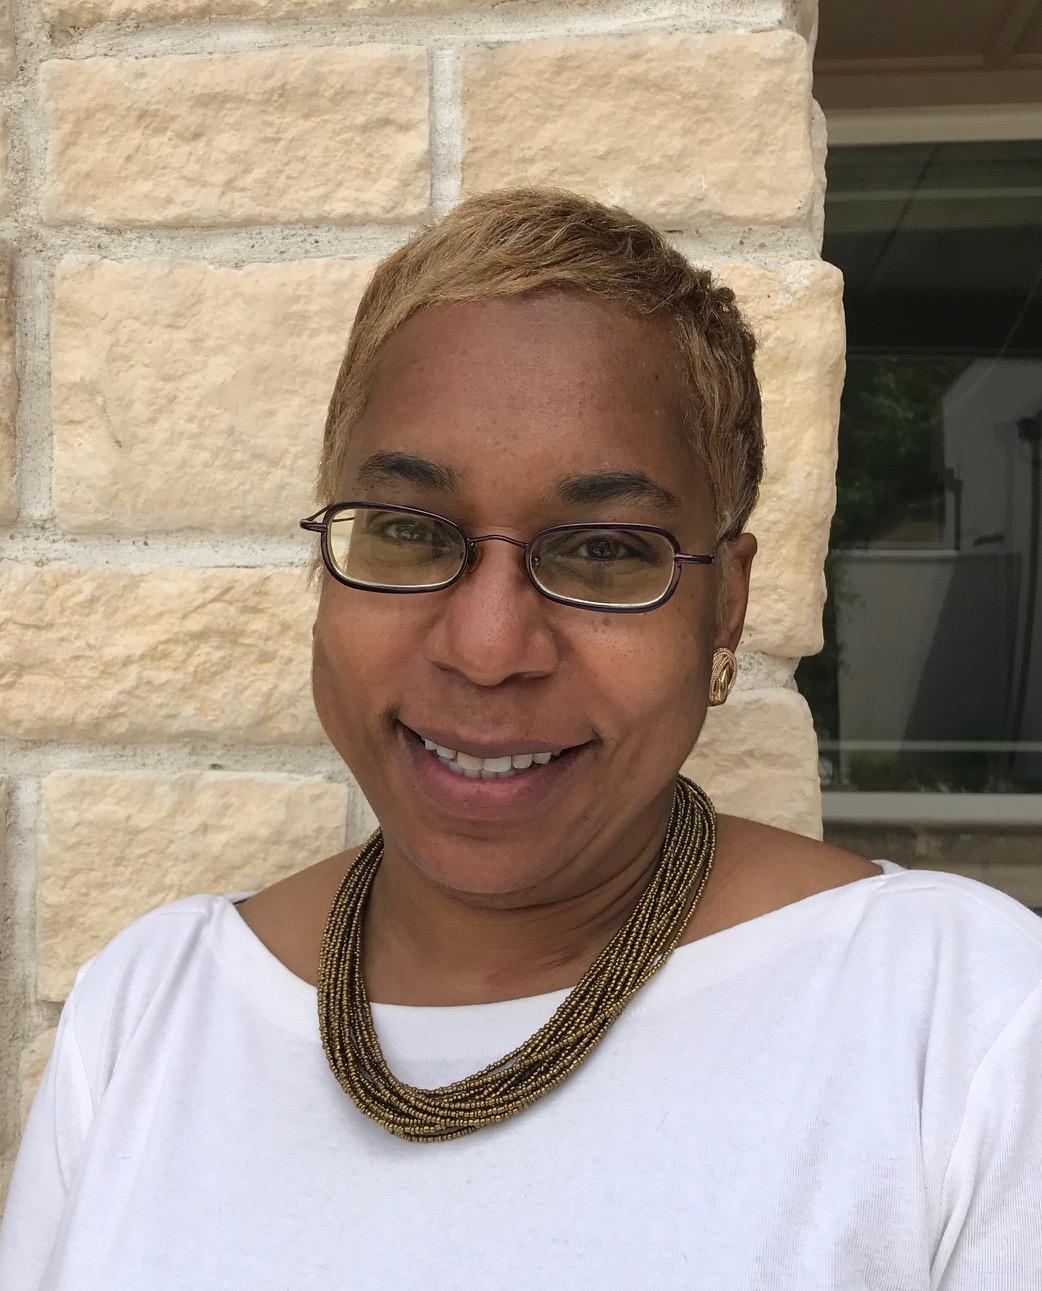 Roshanda Brown - Director of Admissions at Methodist DeSoto Nursing Home